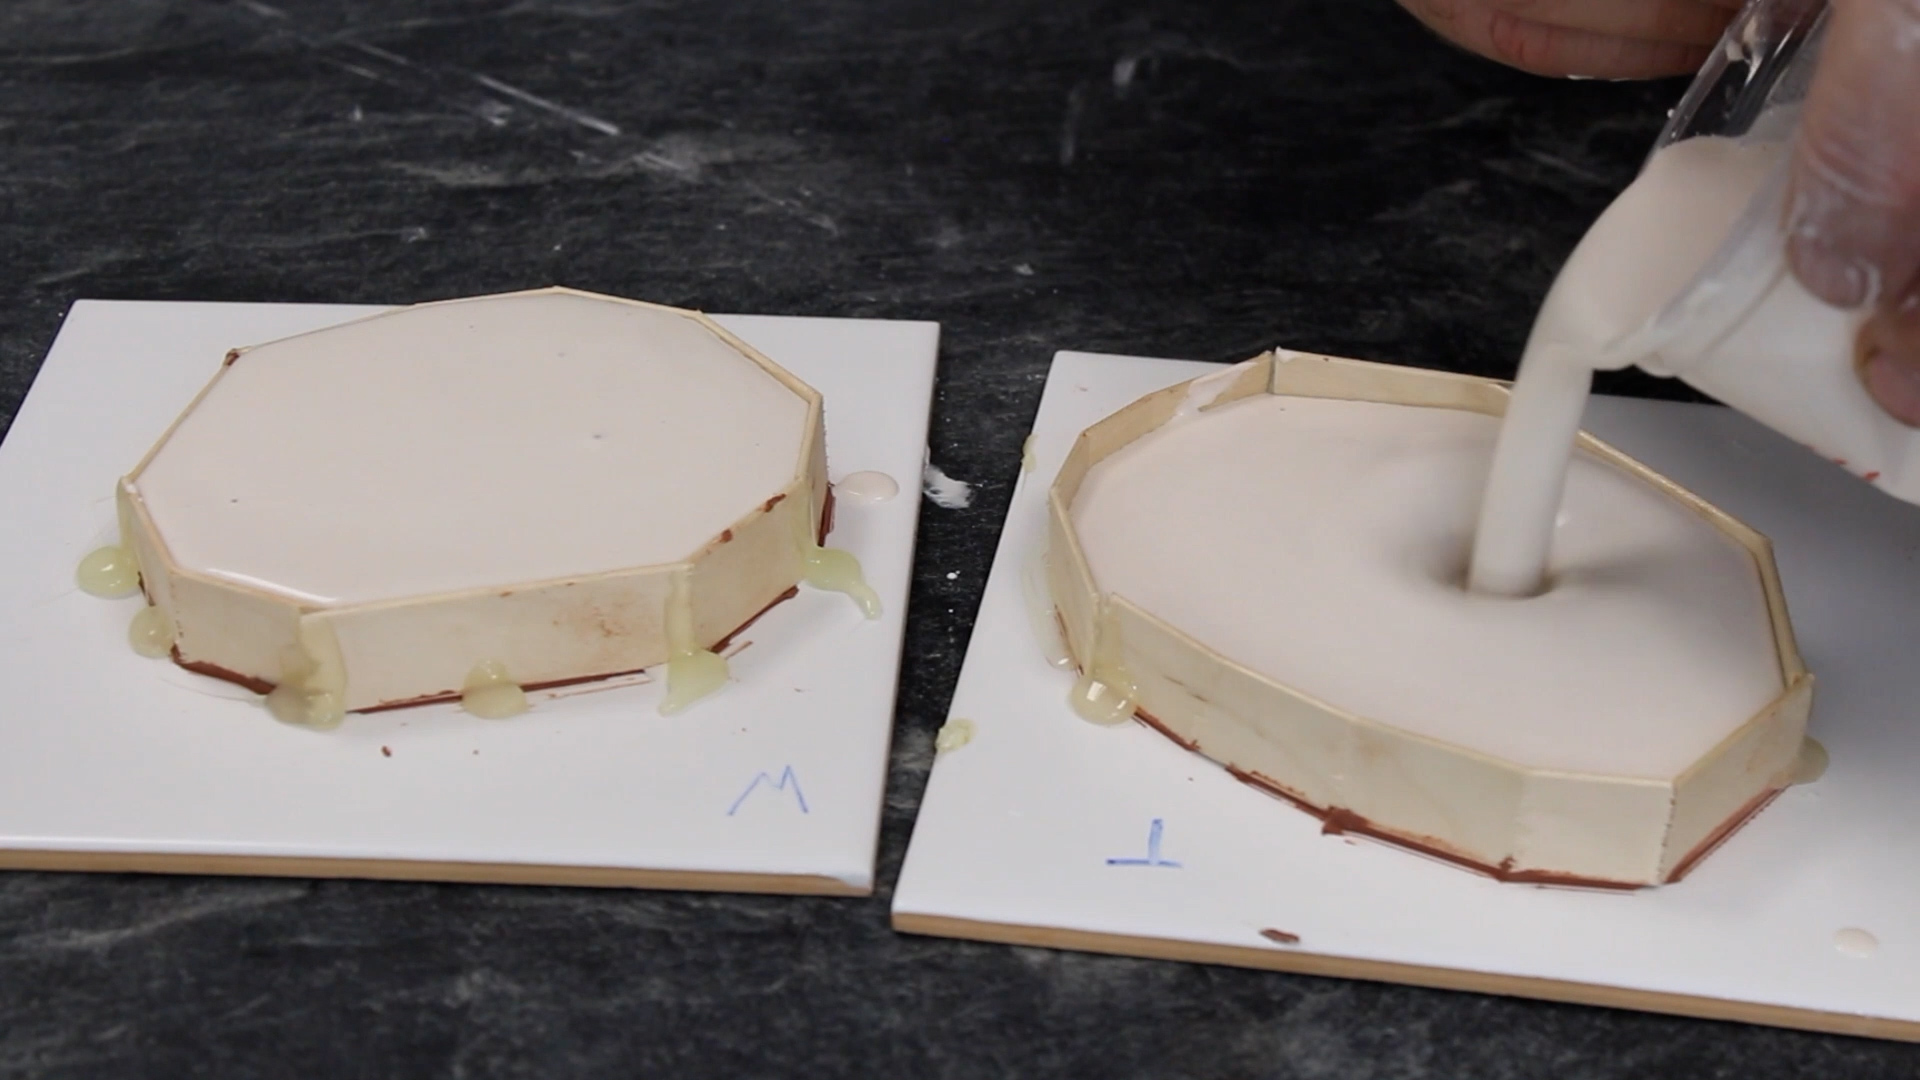 Making Flat Moulds Using Plaster